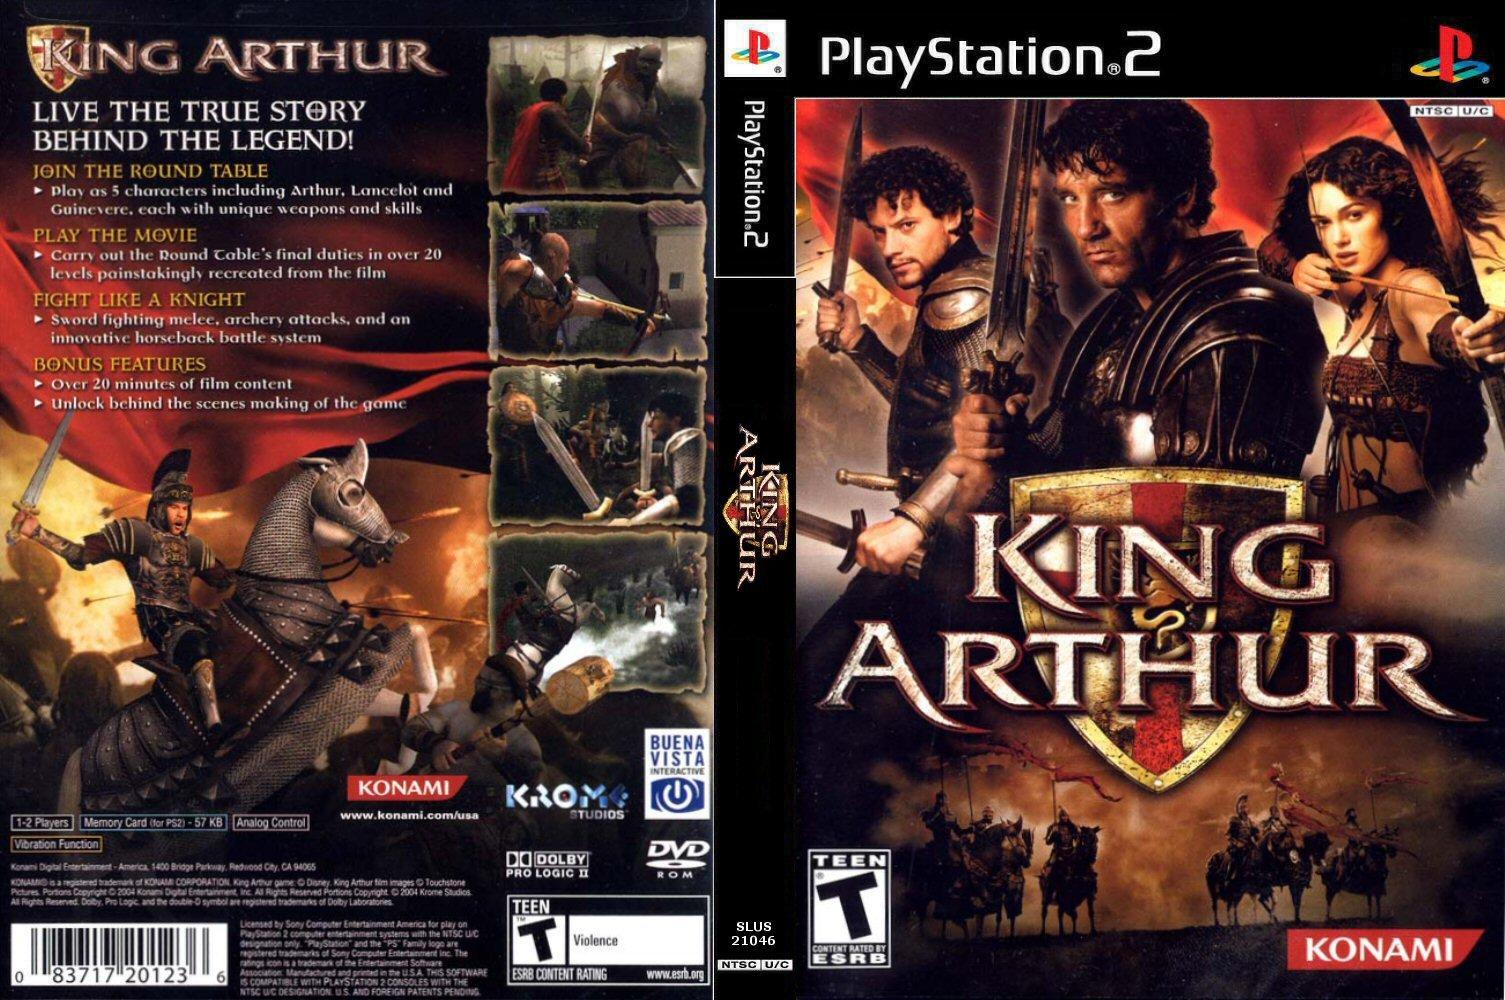 http://1.bp.blogspot.com/_chxw320Daqs/TOnIofaYiwI/AAAAAAAAAJ4/qoVf7yH_Q10/s1600/King_Arthur_Dvd_custom-%5Bcdcovers_cc%5D-front.jpg